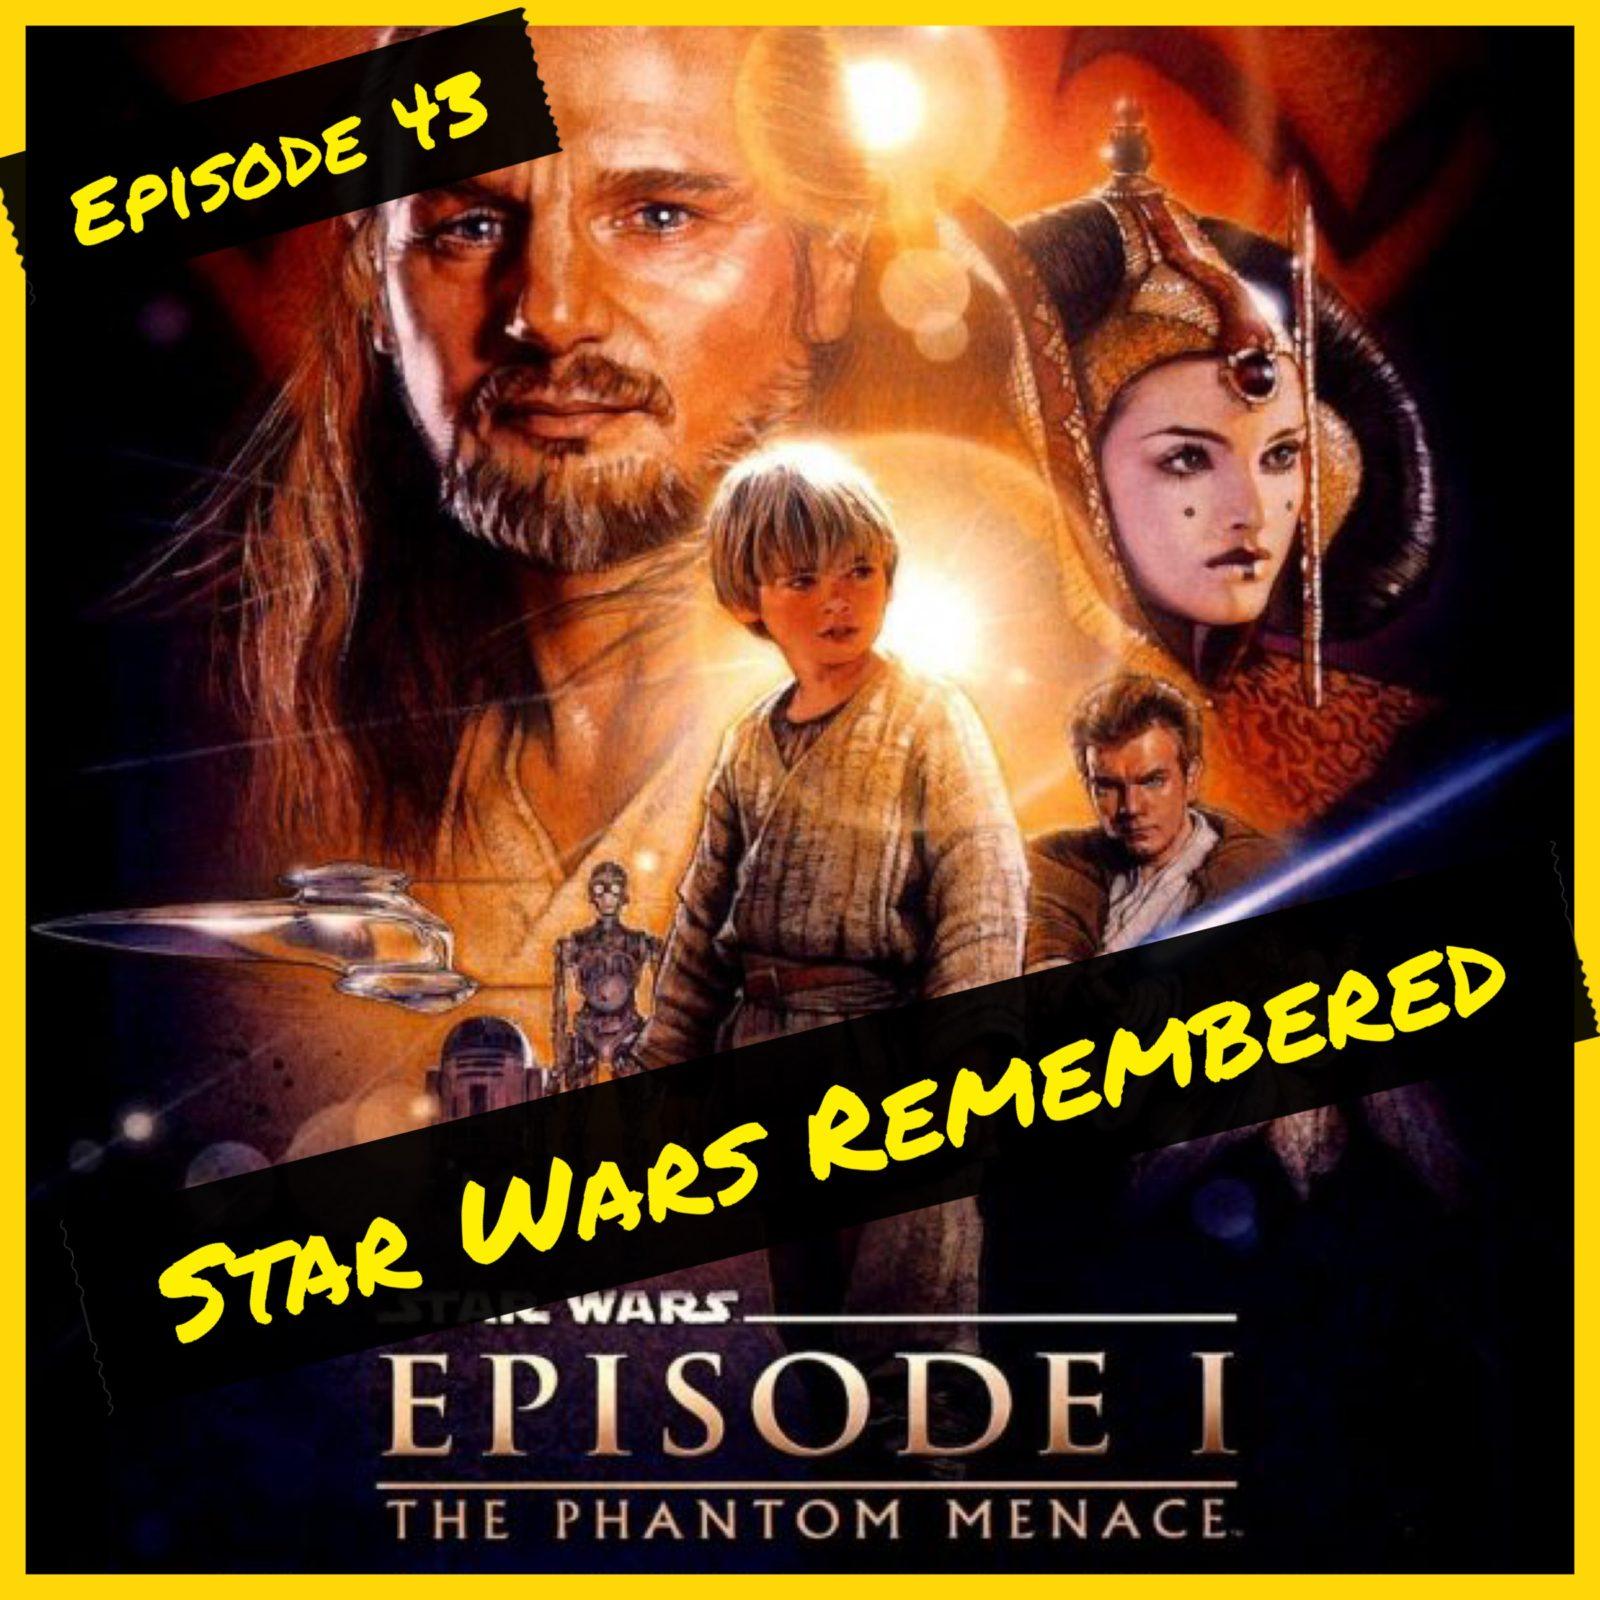 Star Wars Remembered - The Phantom Menace